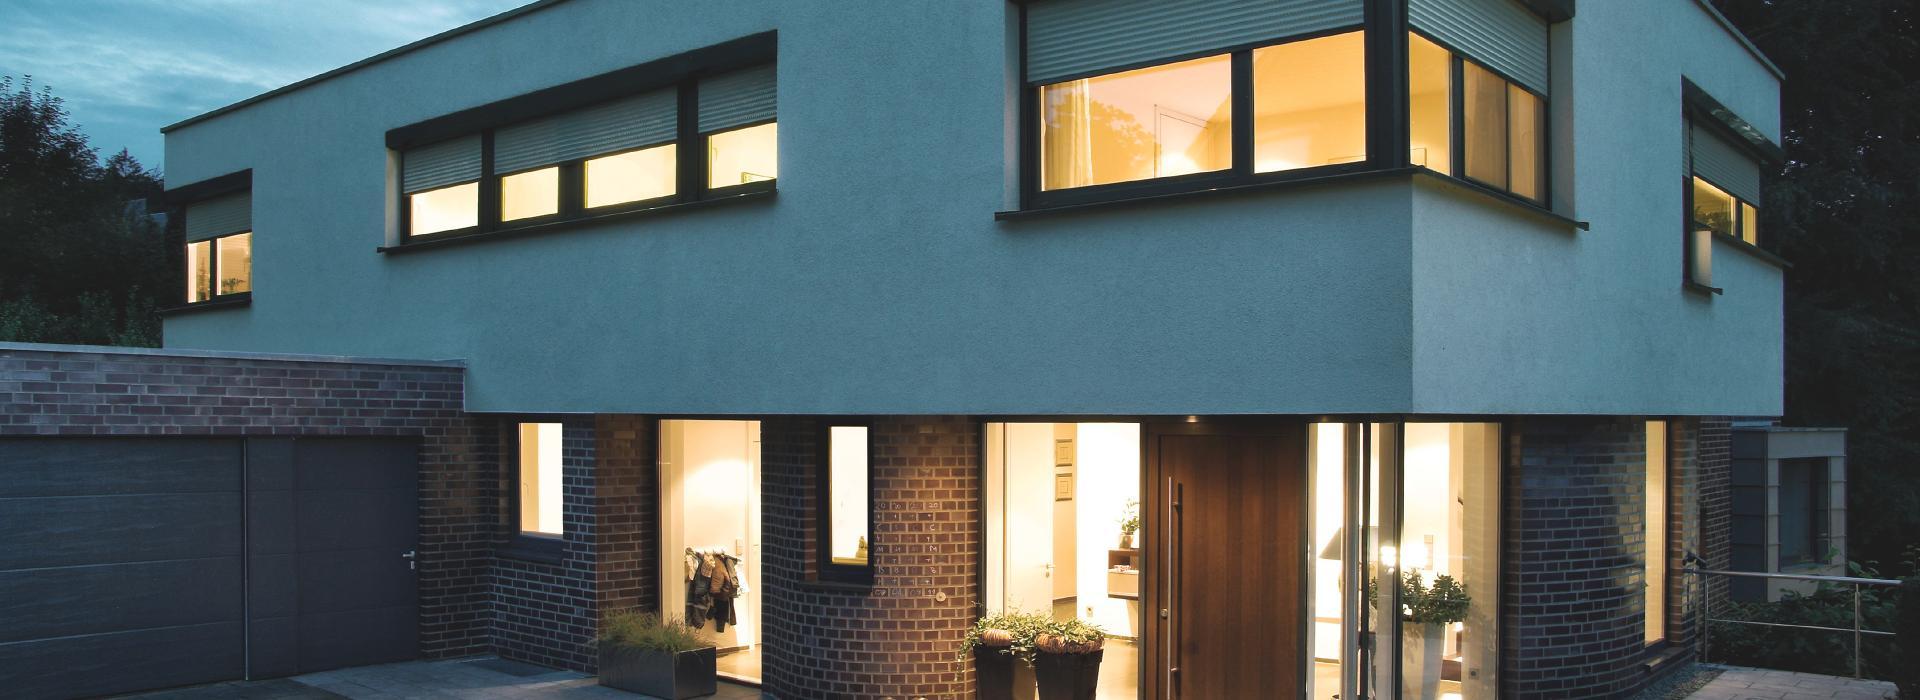 vorbaurollladen von roma der energiesparer vor dem fenster. Black Bedroom Furniture Sets. Home Design Ideas